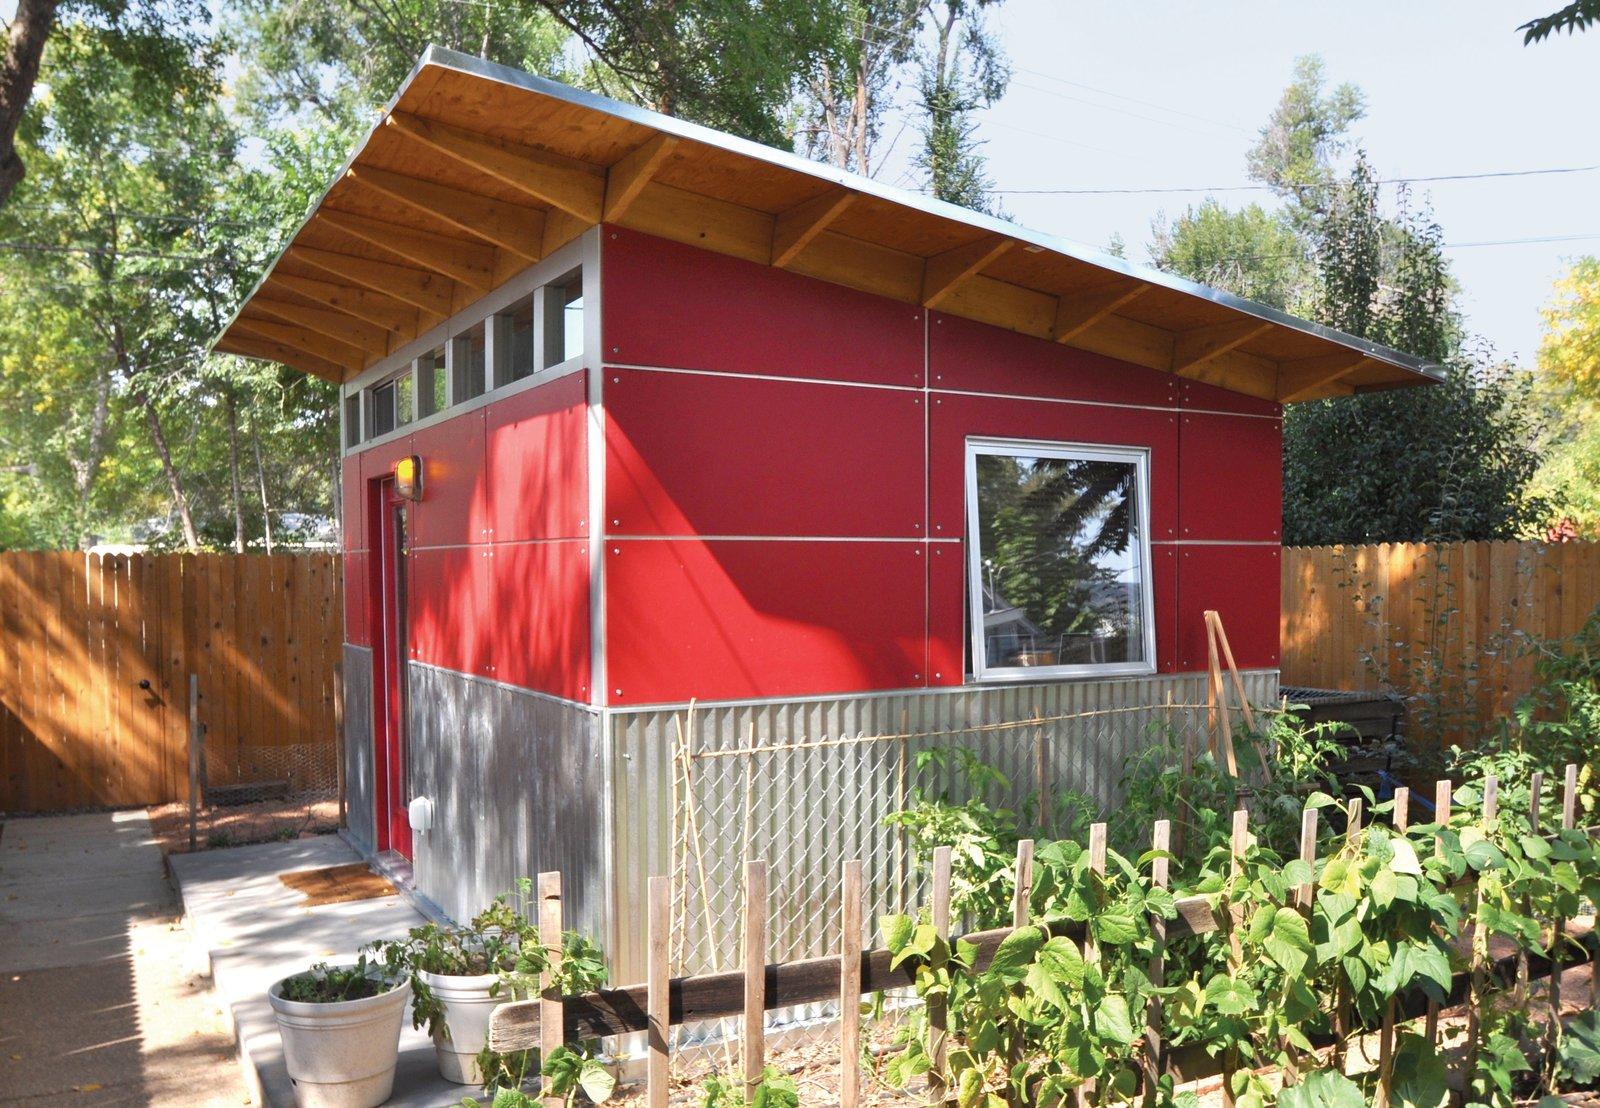 #chickencoop #gardenshed #modernshed